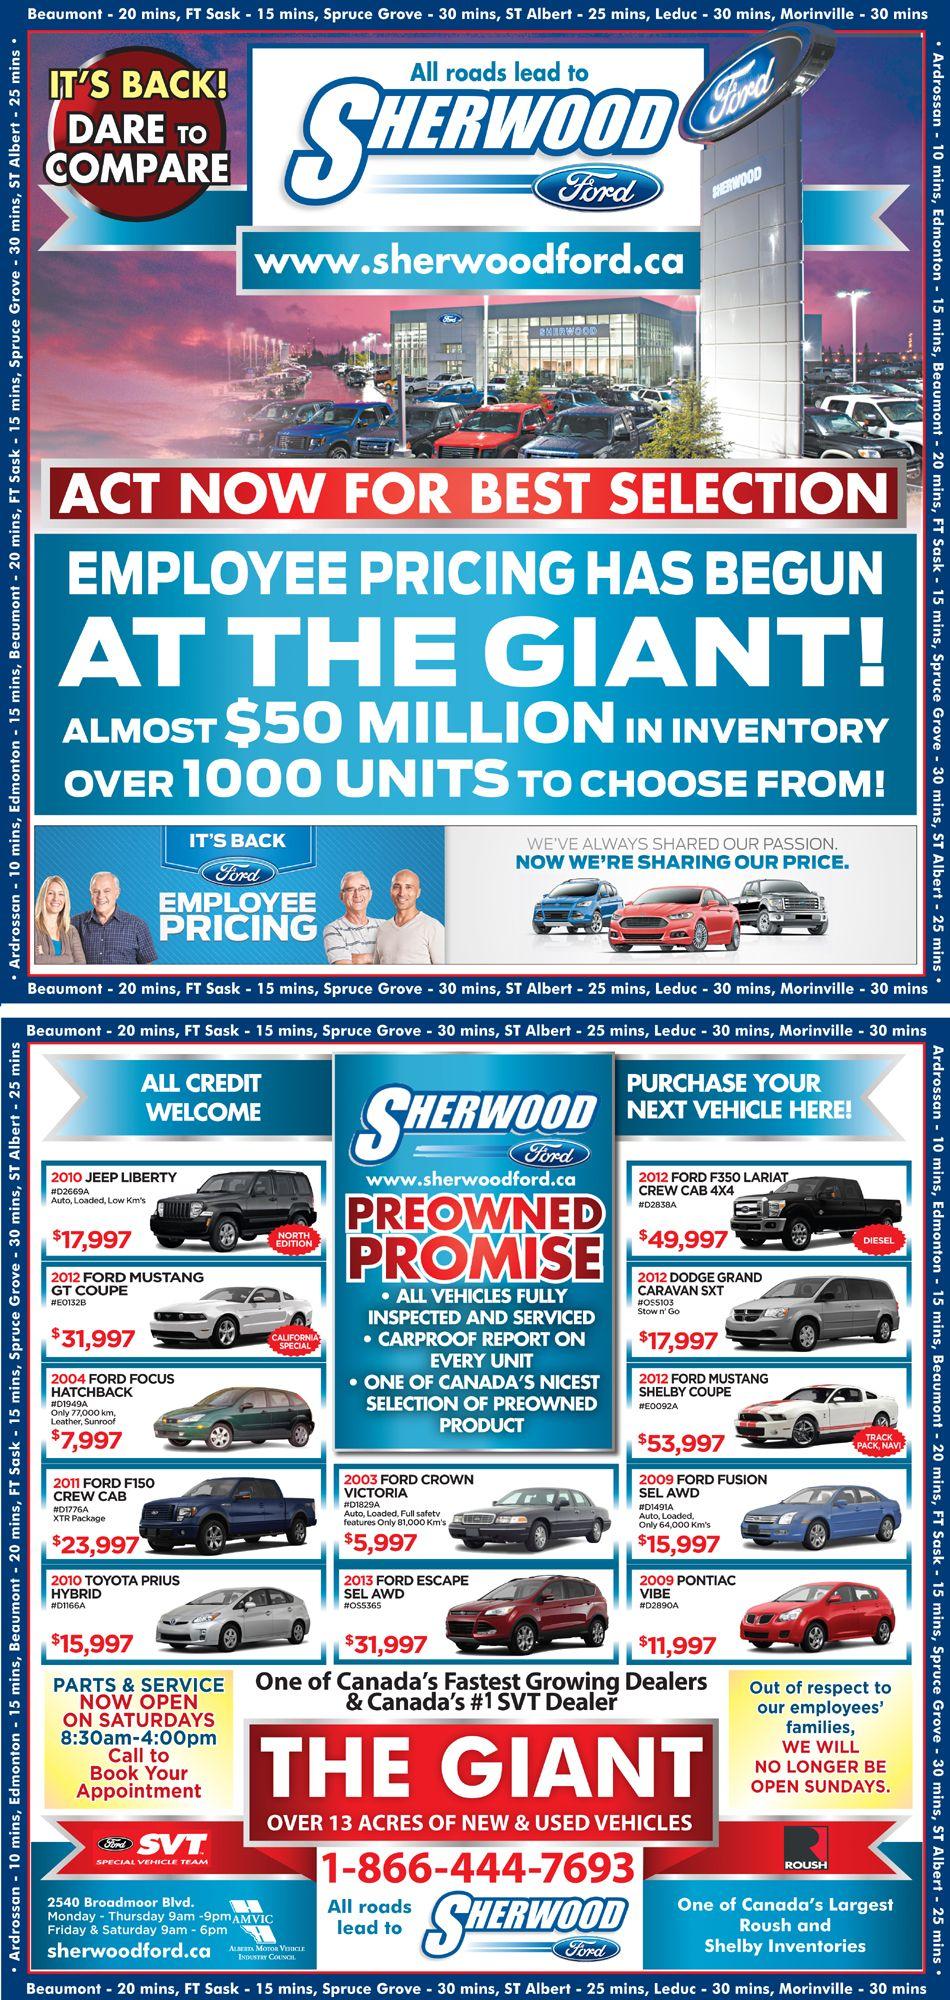 Sherwood Fords deals #yeg #shpk #ford #sales #trucks #cars ...